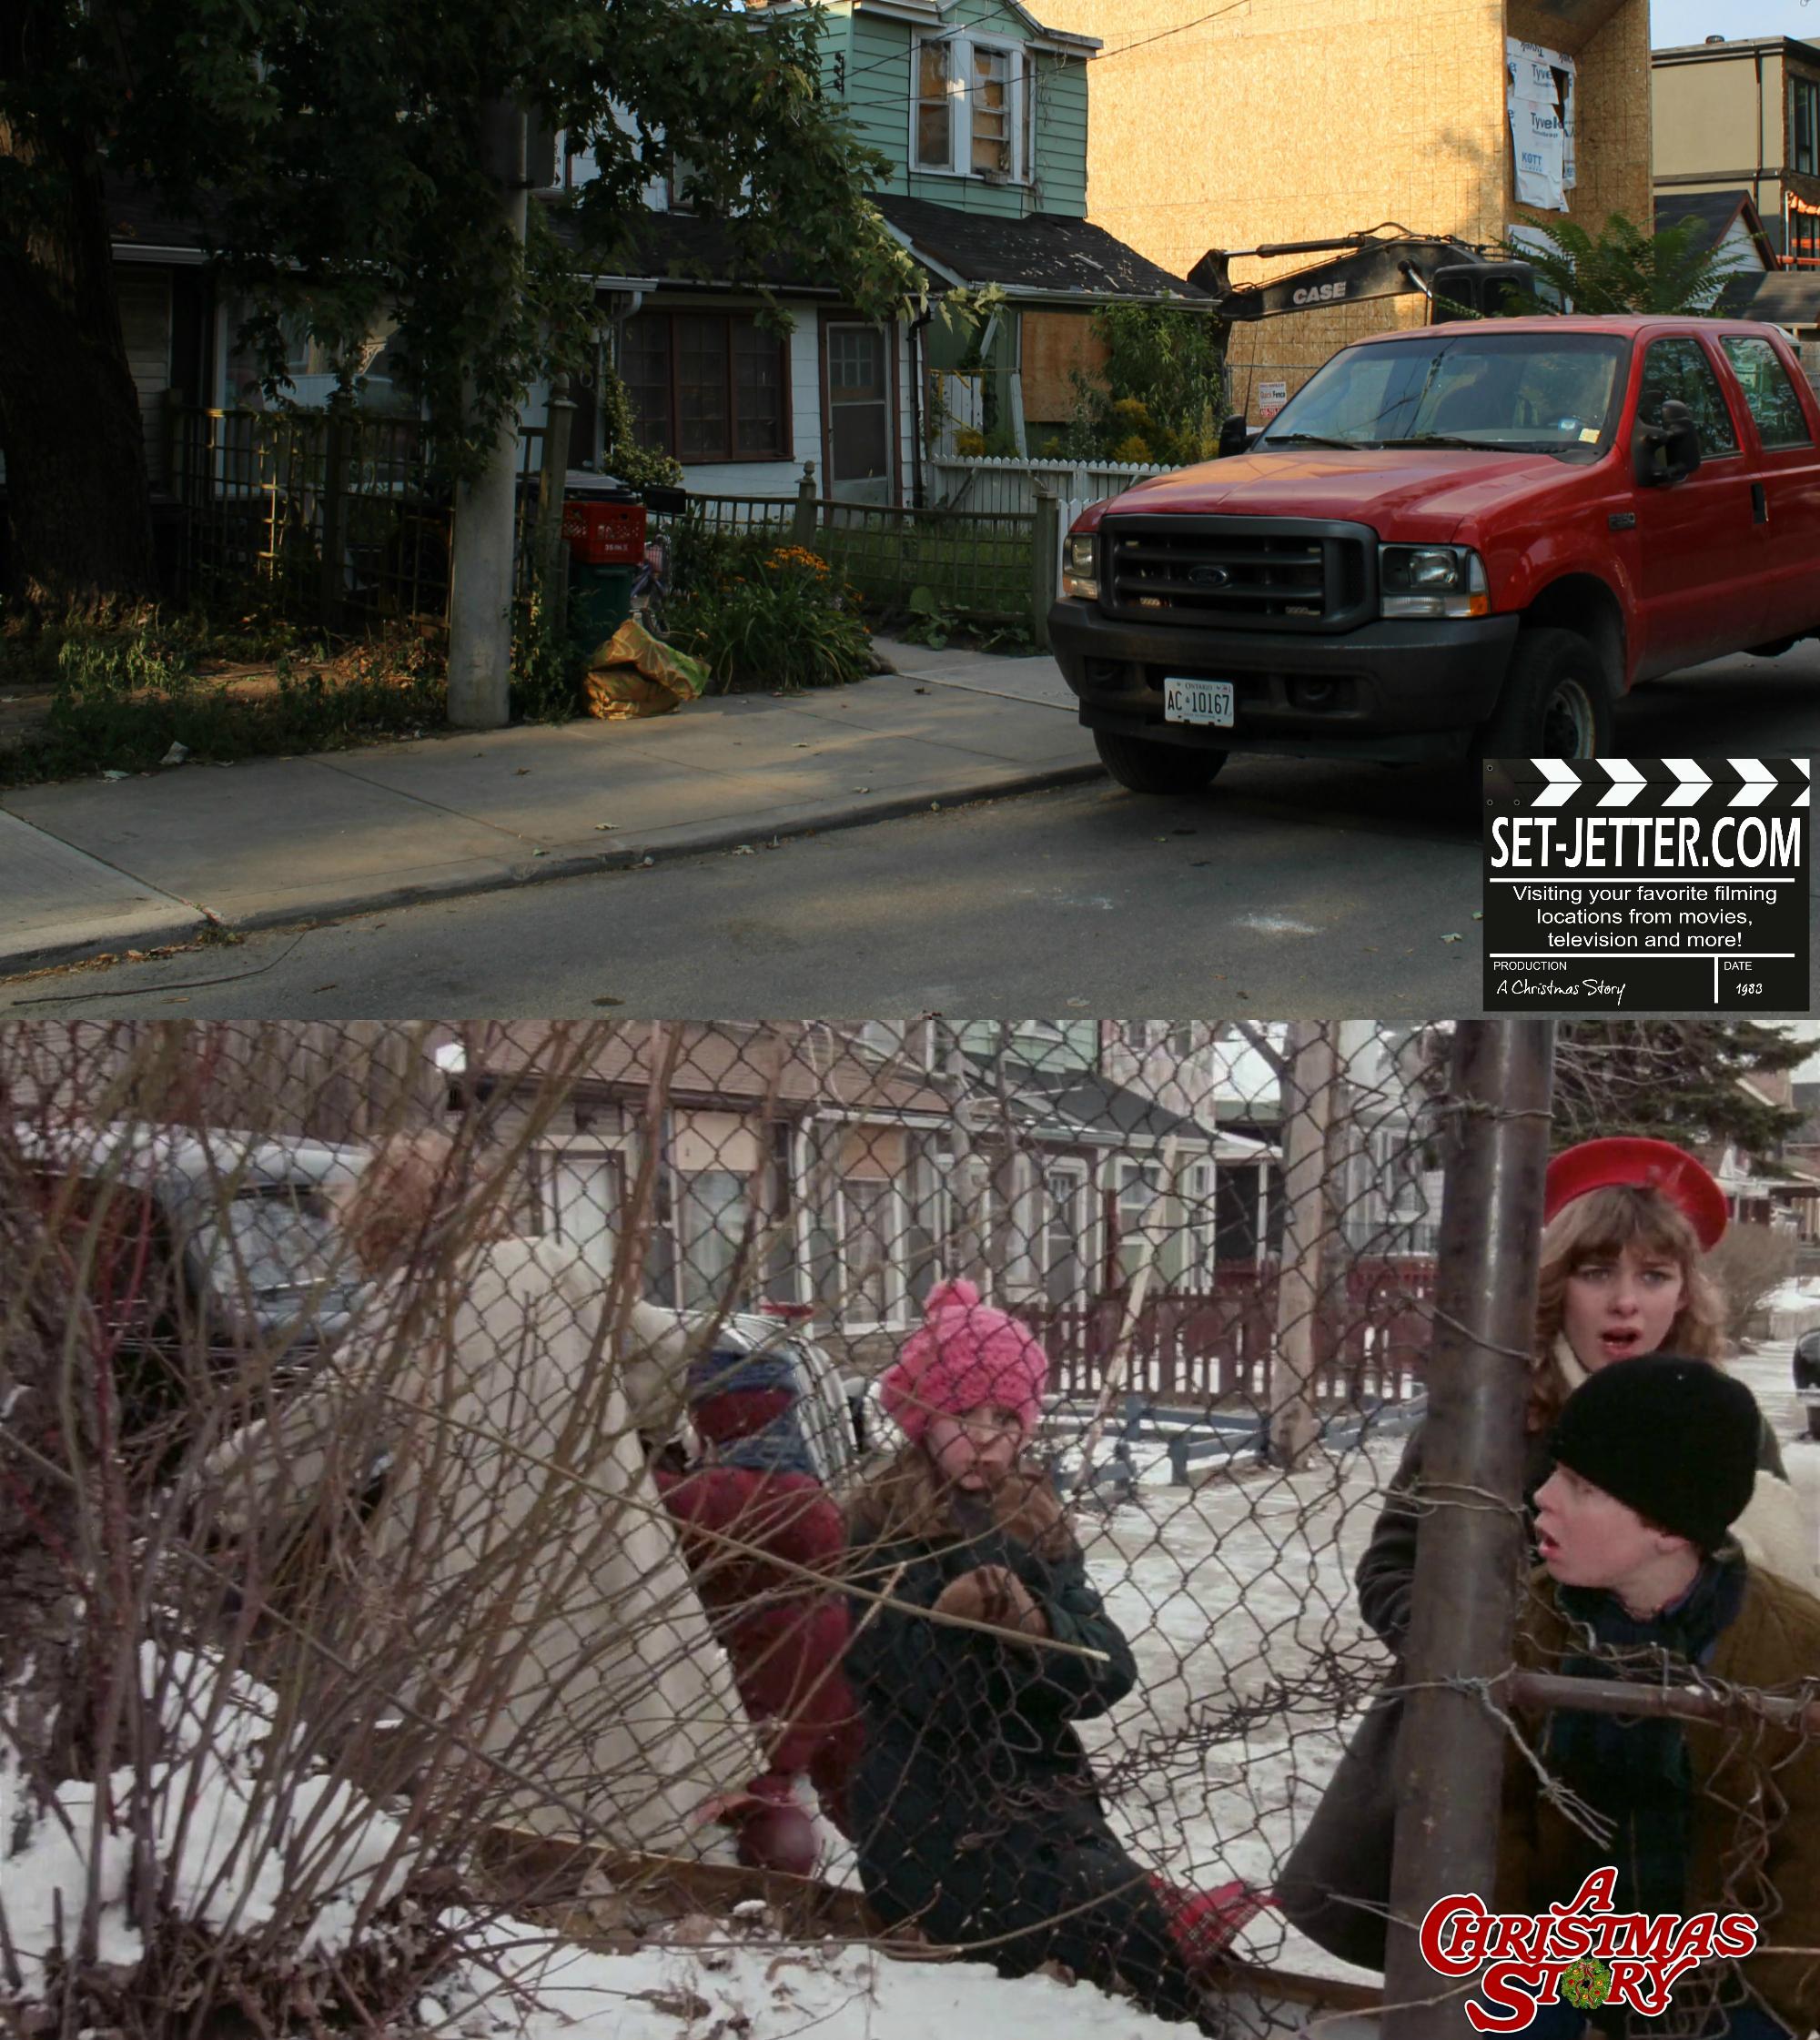 Christmas Story comparison 71.jpg